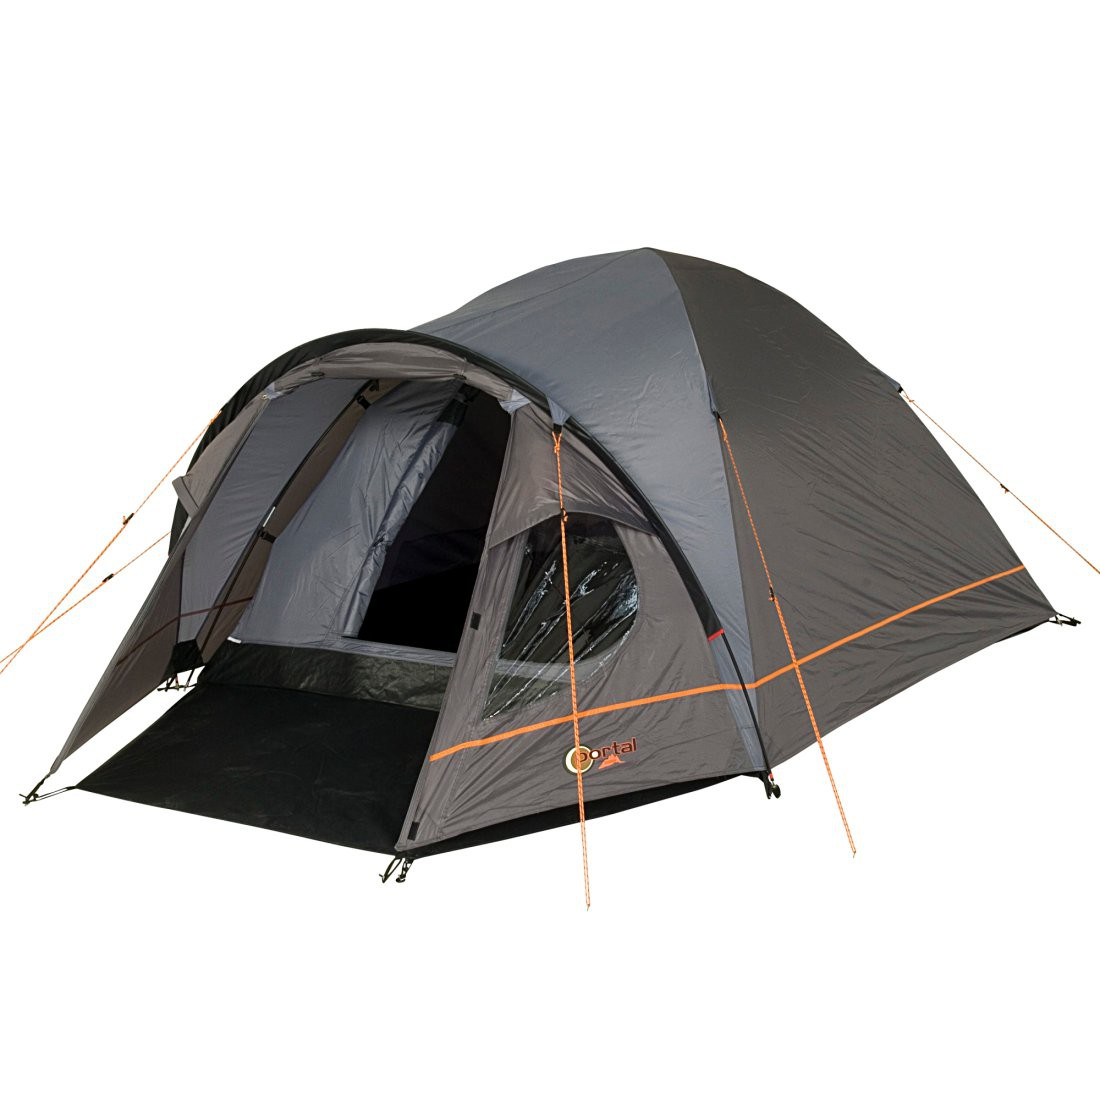 Portal - BRAVO 3 Personen - Image 1  sc 1 st  C&ing-Outdoor.eu & Buy Portal Bravo 3 - 3 person dome tent with vestibule 4000mm ...